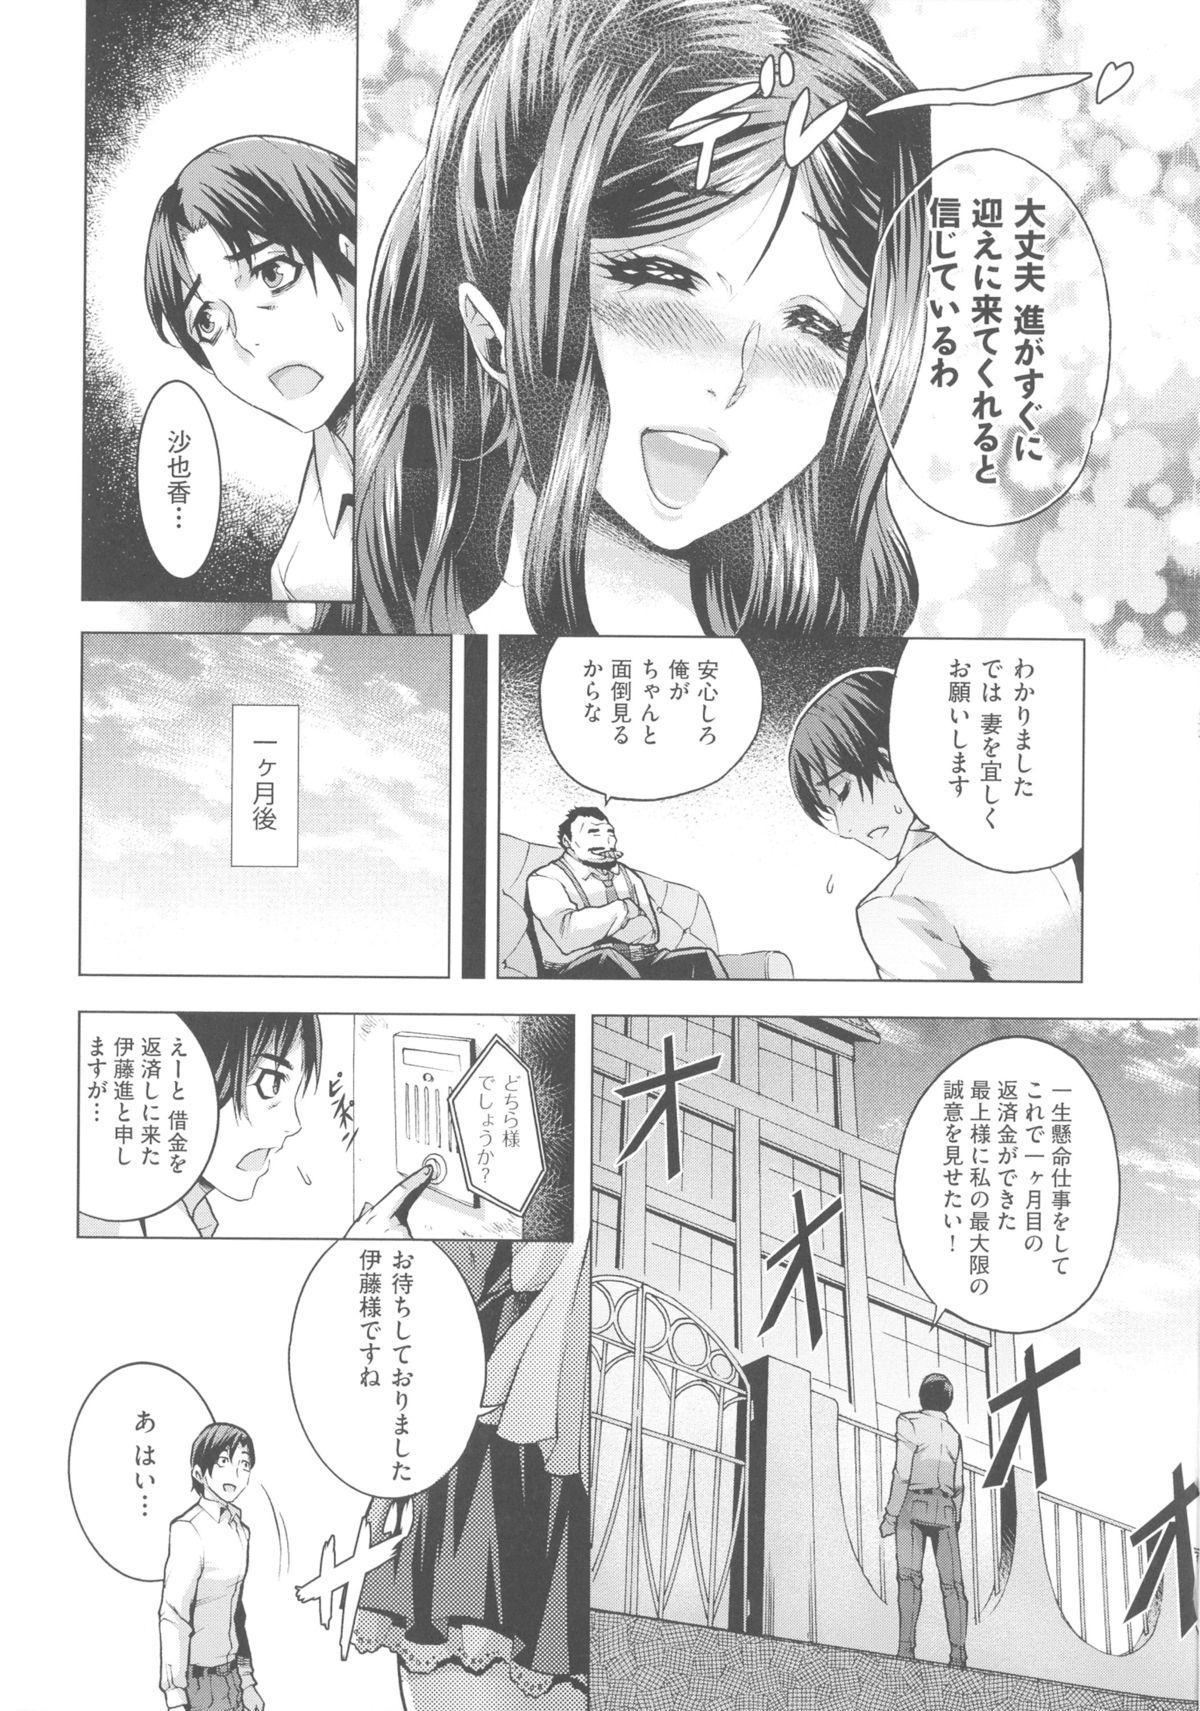 Chijou no Kiwami - Extremity of the blind love 32